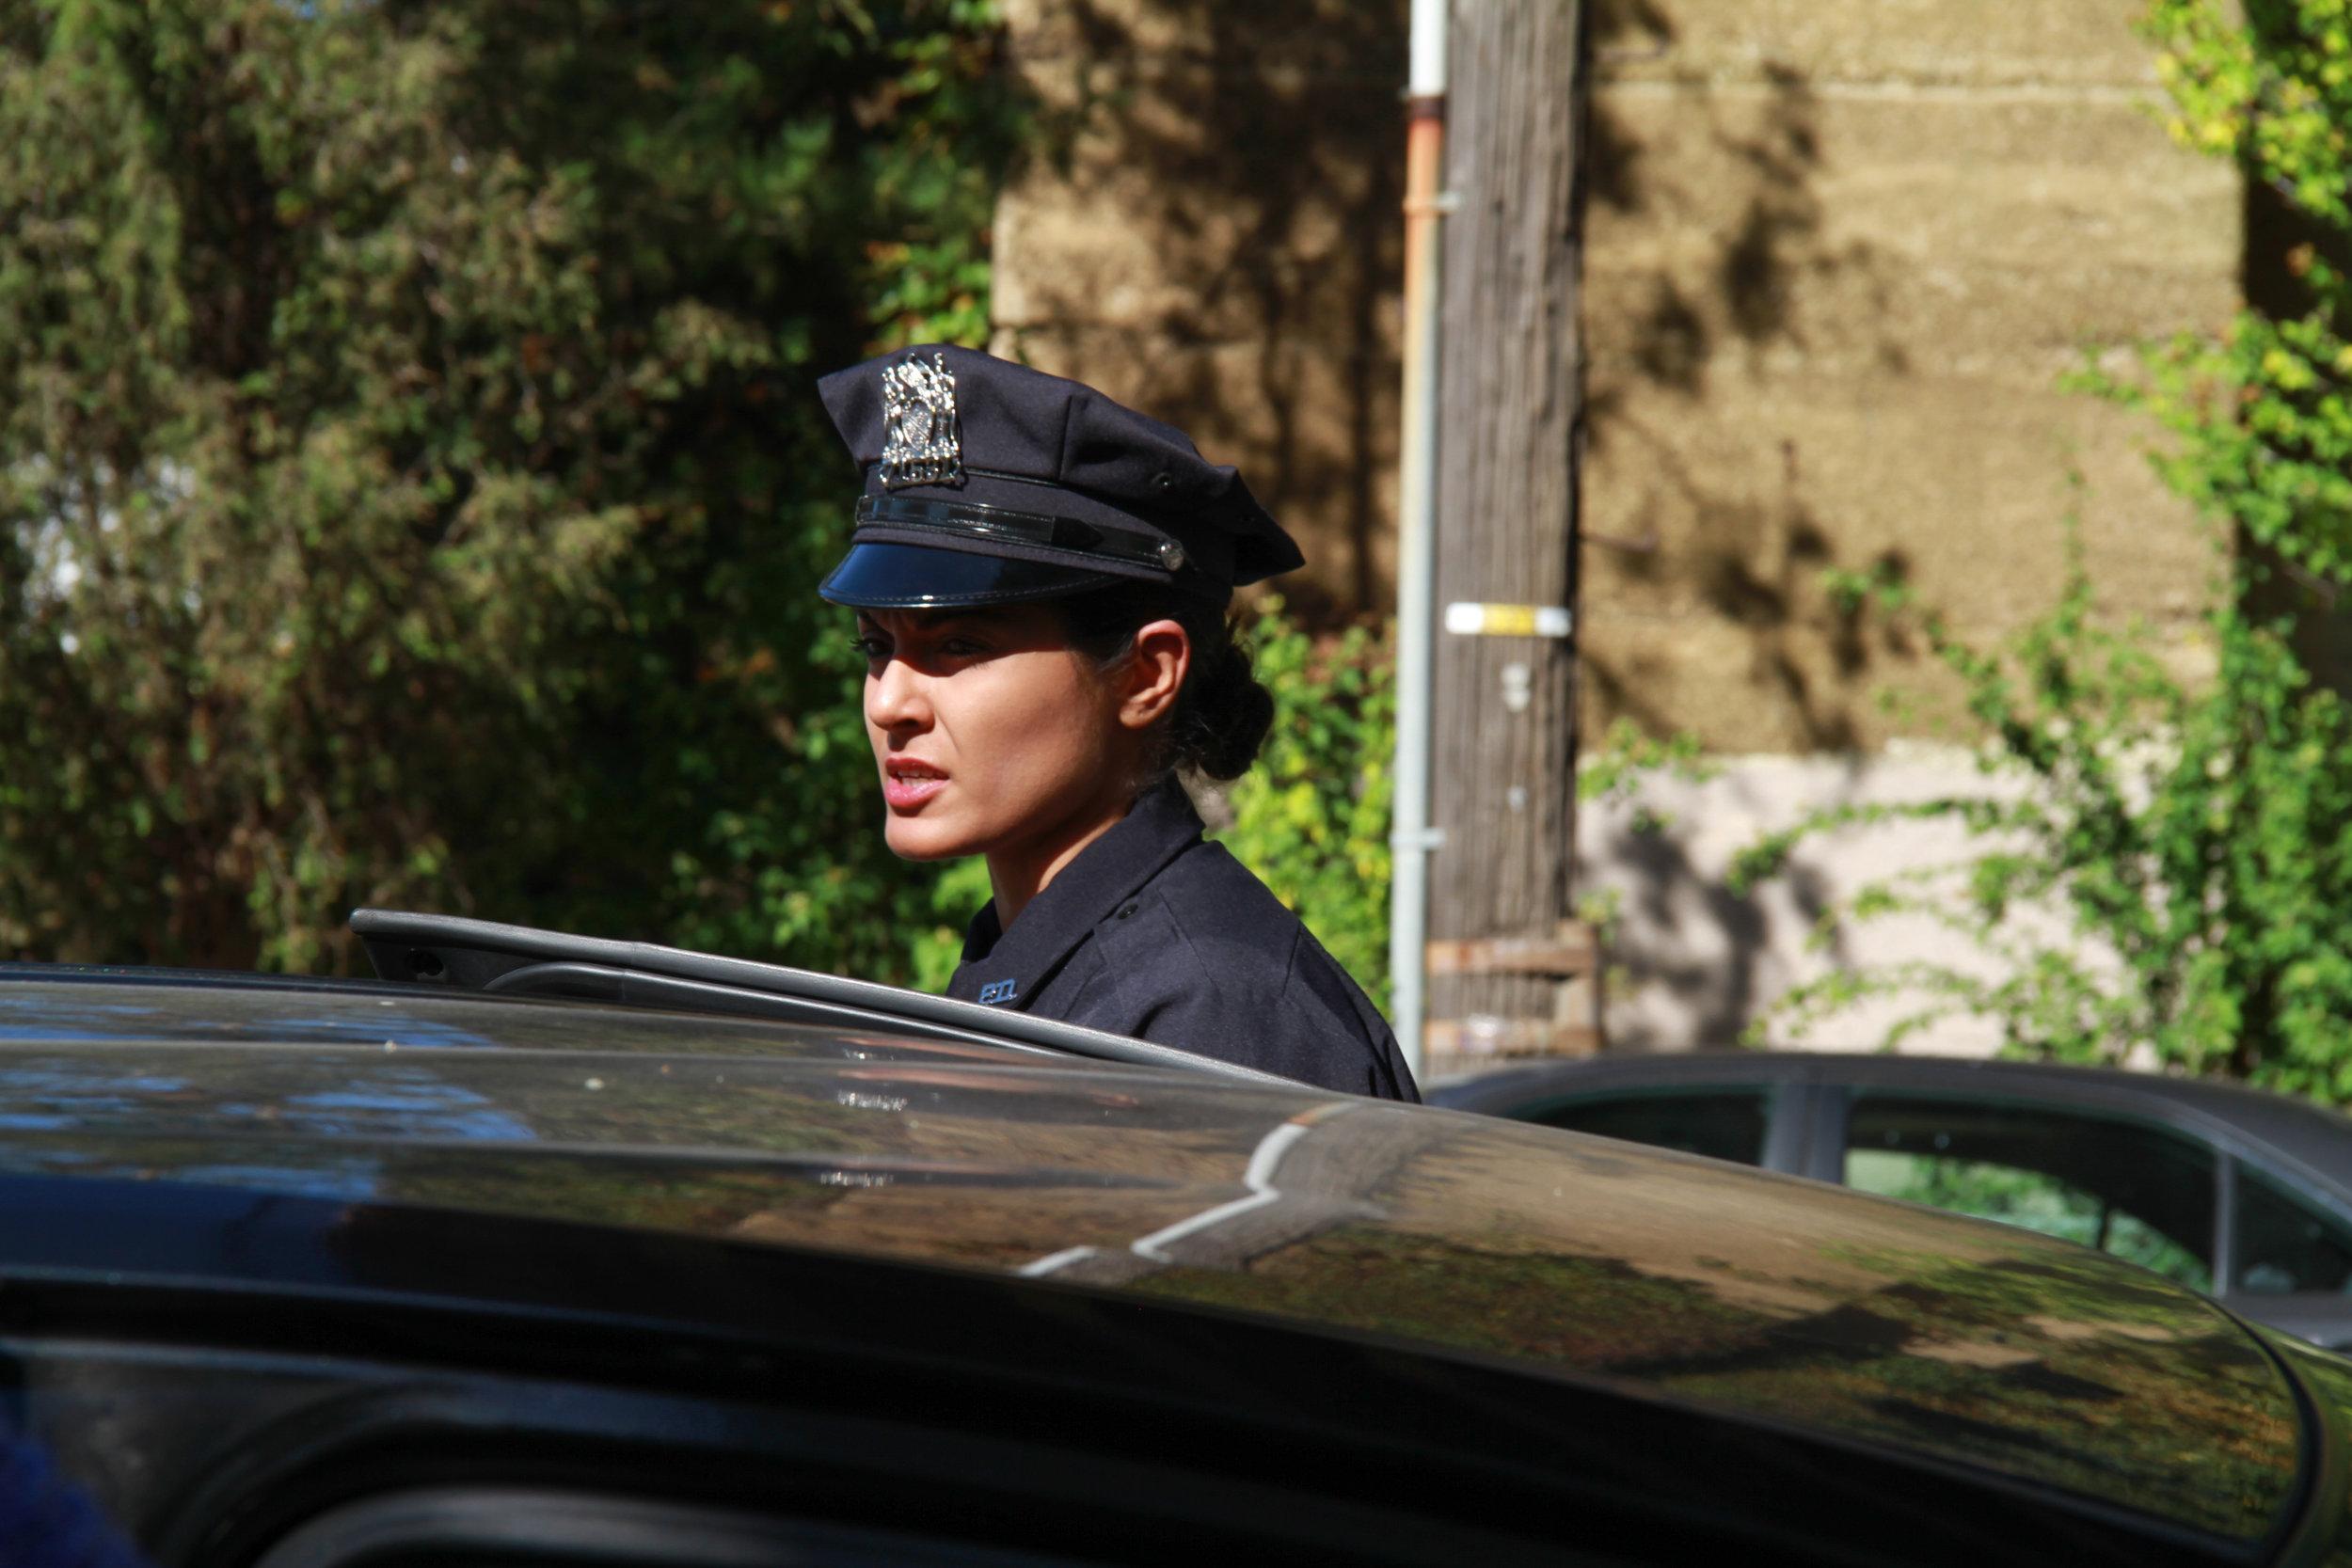 Qurrat Kadwani as Officer Mack